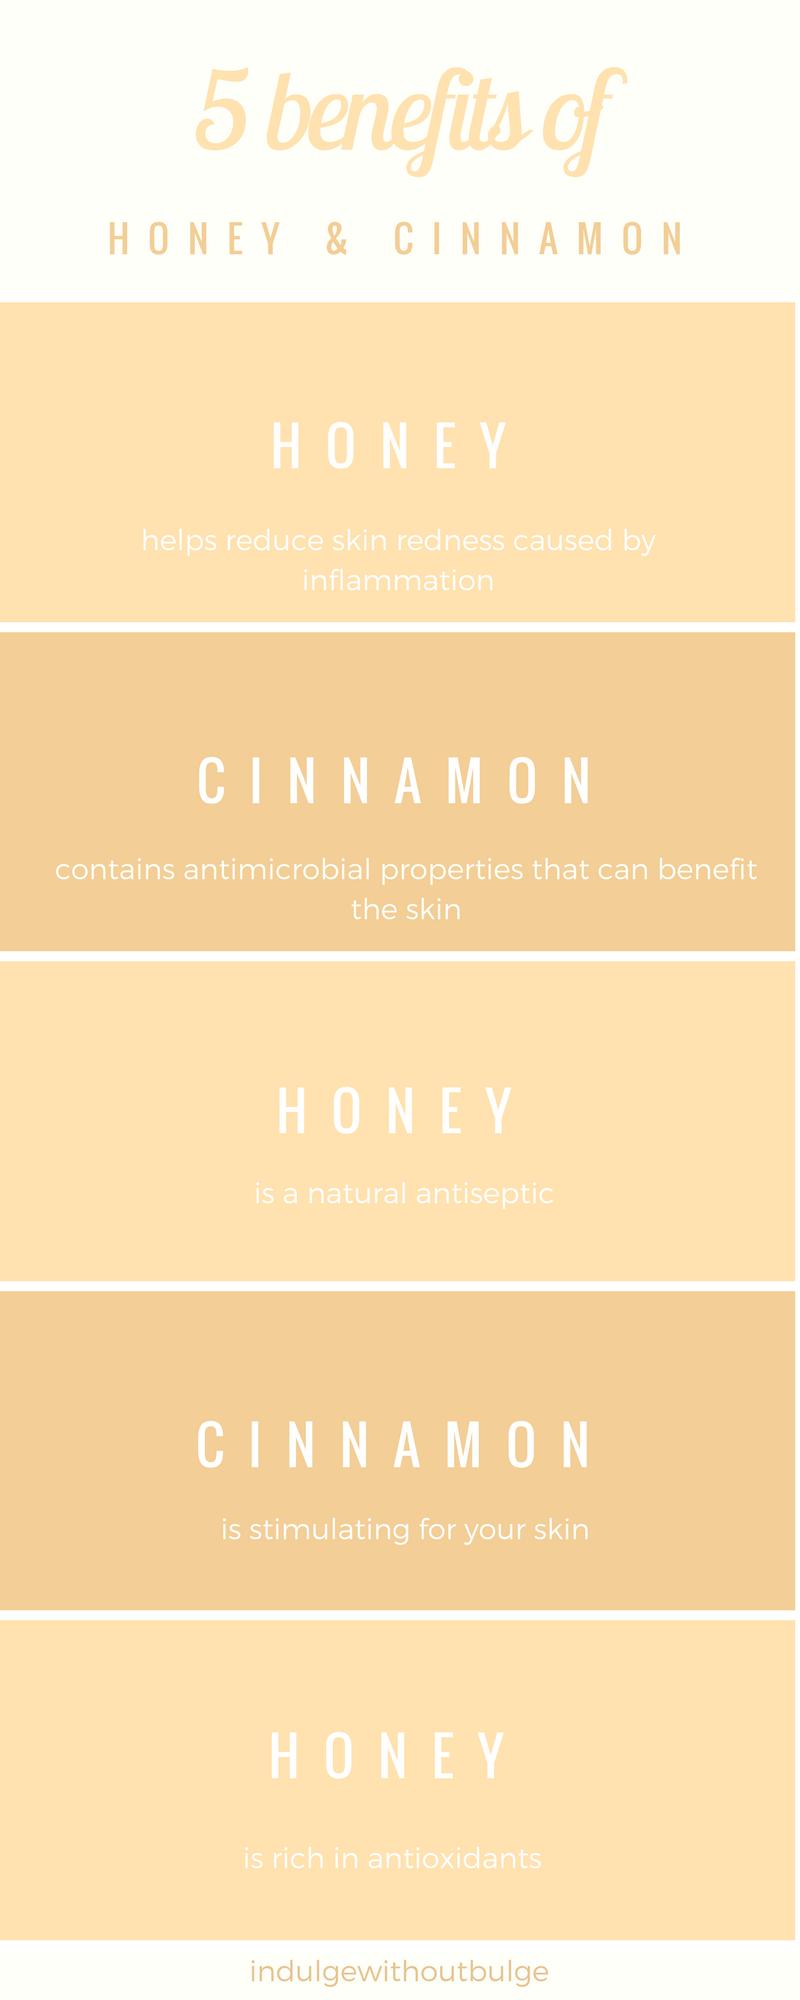 5 benefits of cinnamon and honey